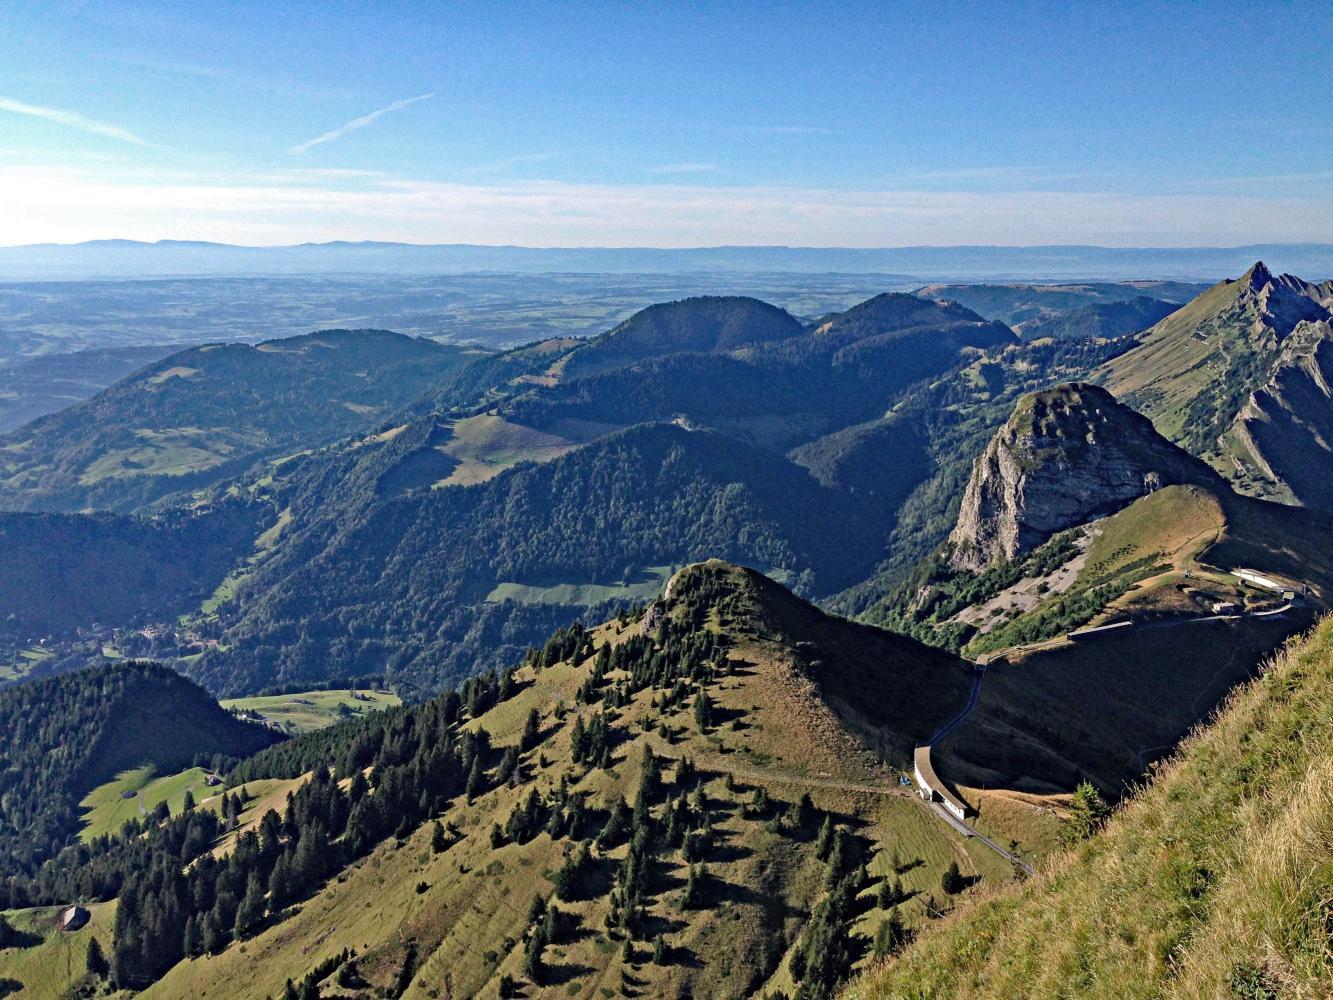 Sonchaux + Rochers de Naye hike Bike Climb - PJAMM Cycling